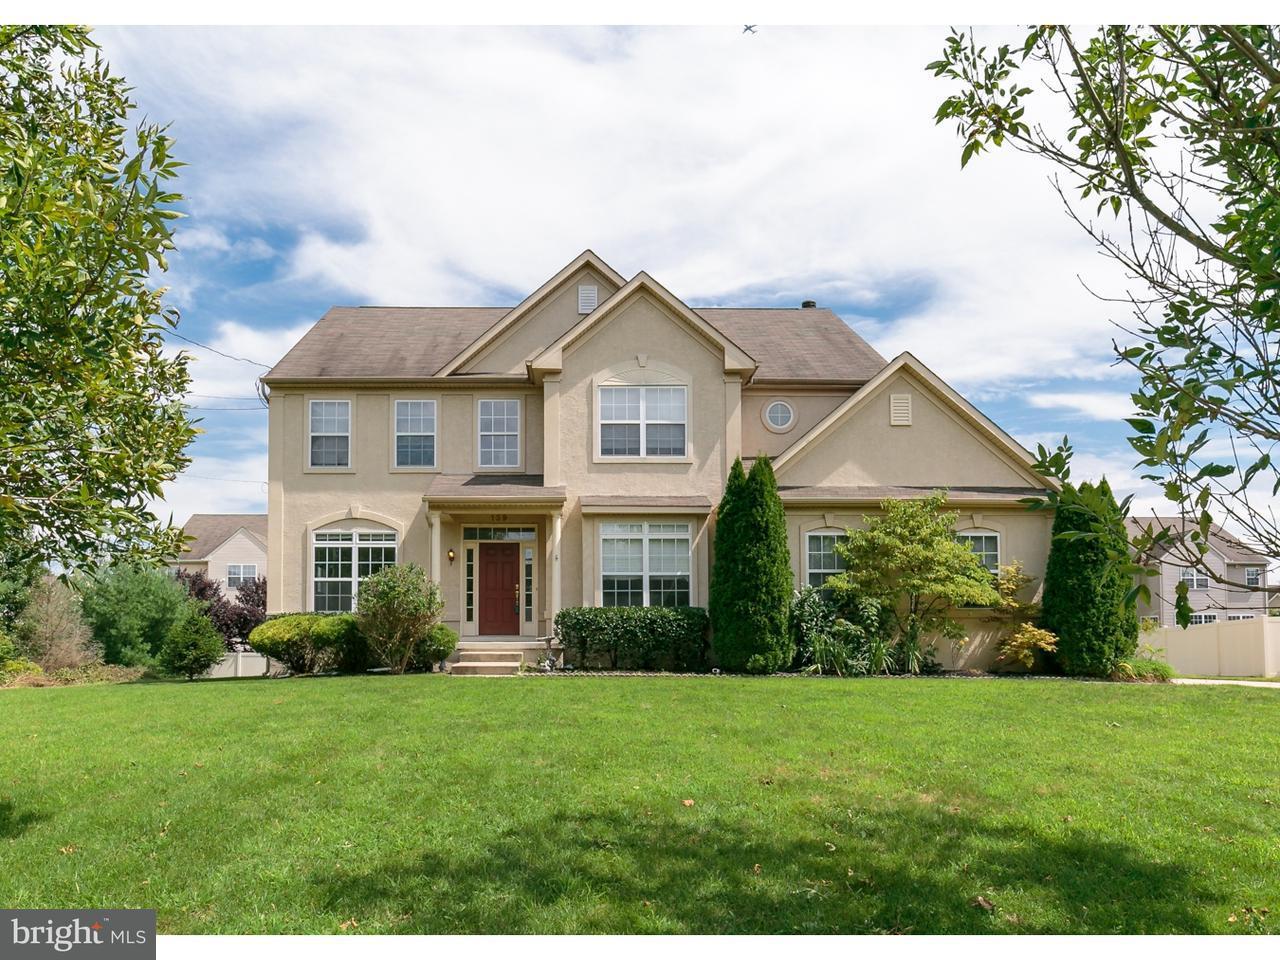 独户住宅 为 销售 在 139 NEW FREEDOM Road Berlin Boro, 新泽西州 08009 美国